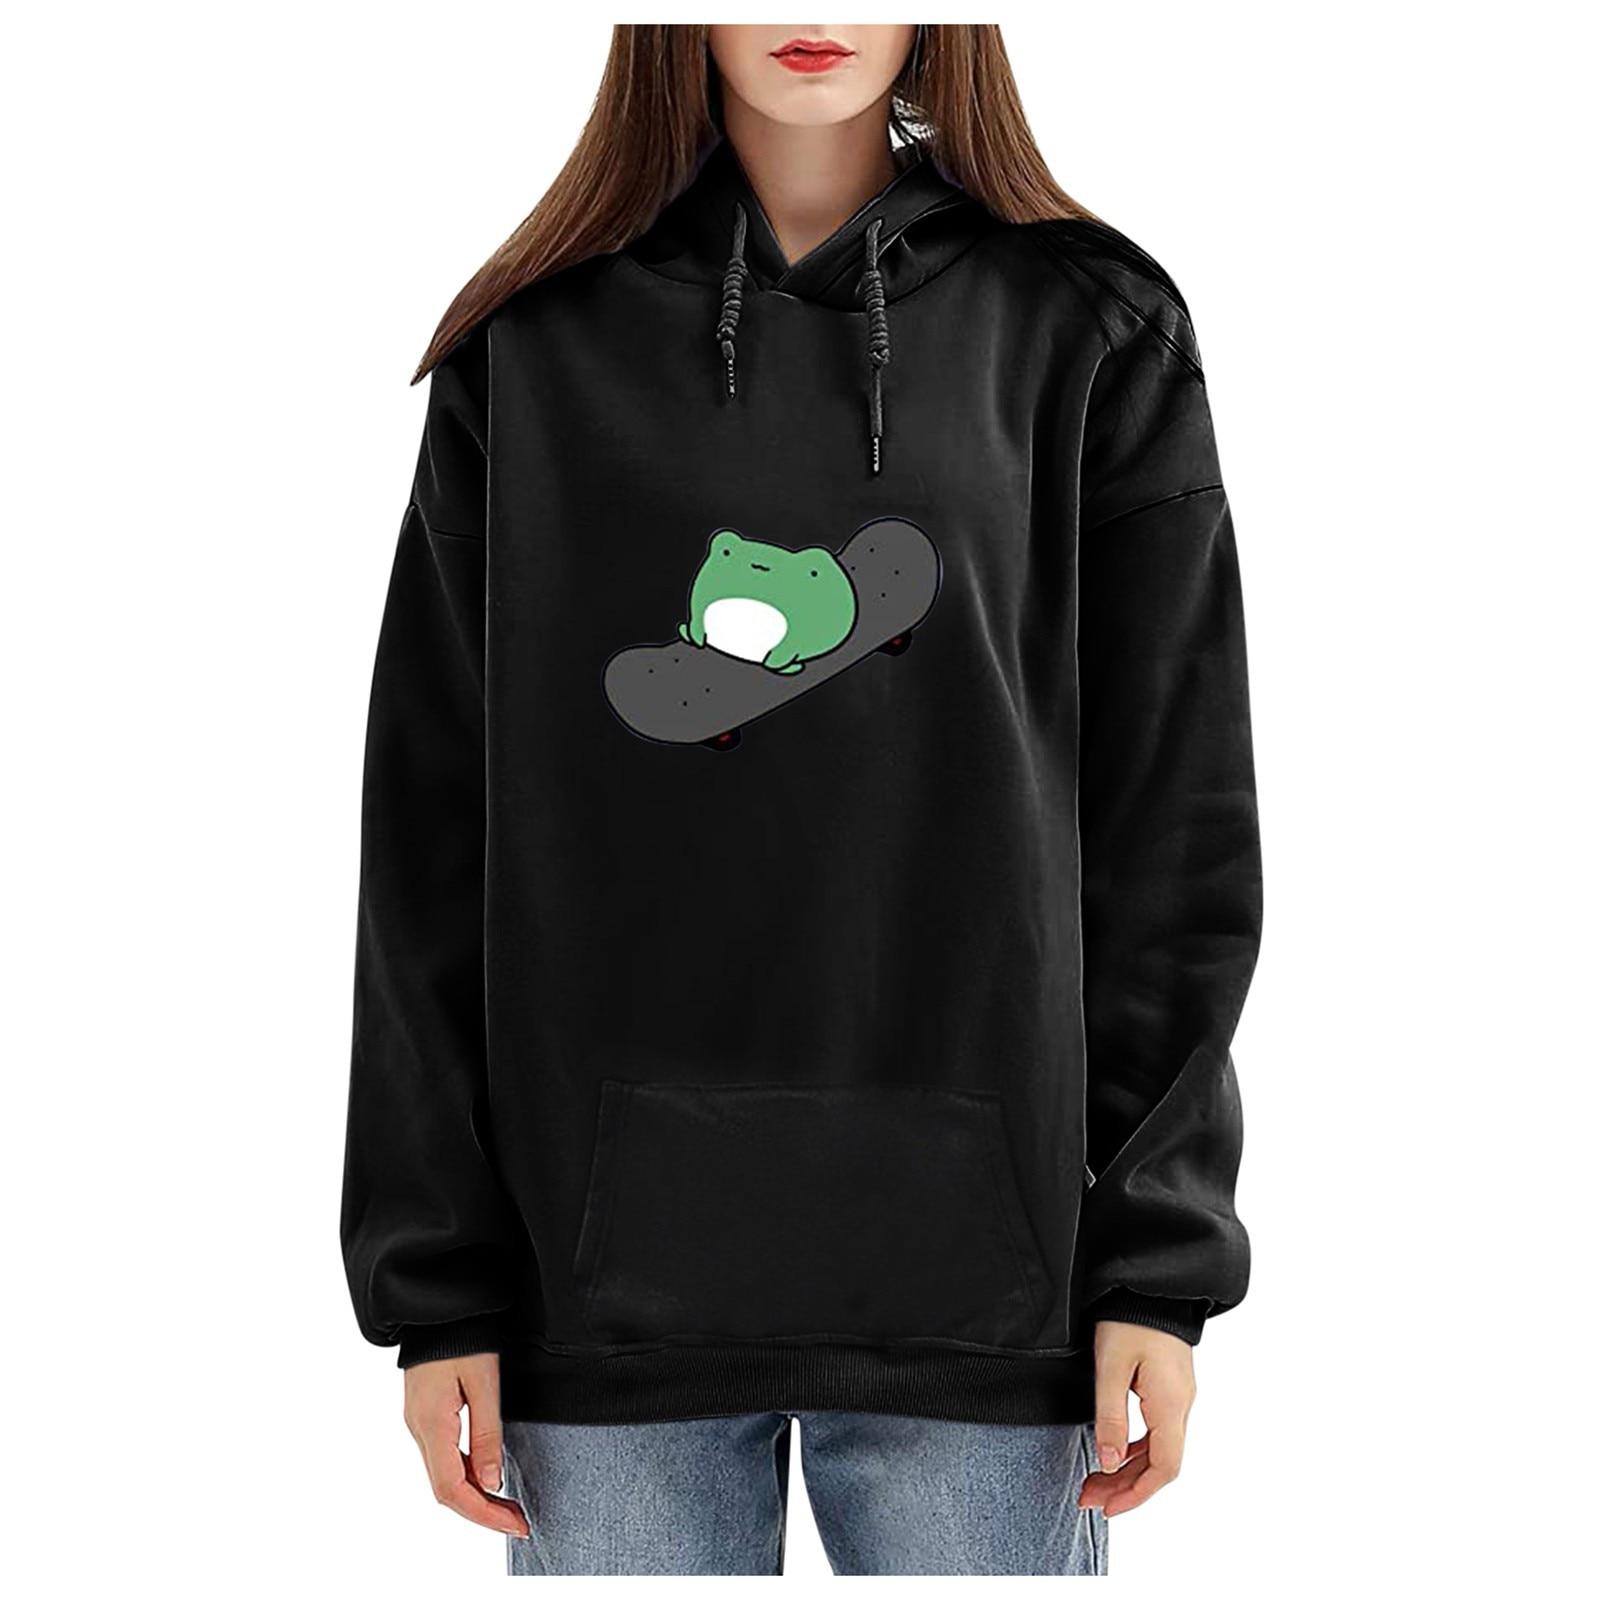 harajuku aesthetic bear anime hoodie women korean kawaii crewneck long sleeve oversized fall winter clothes kpop streetwear tops 15